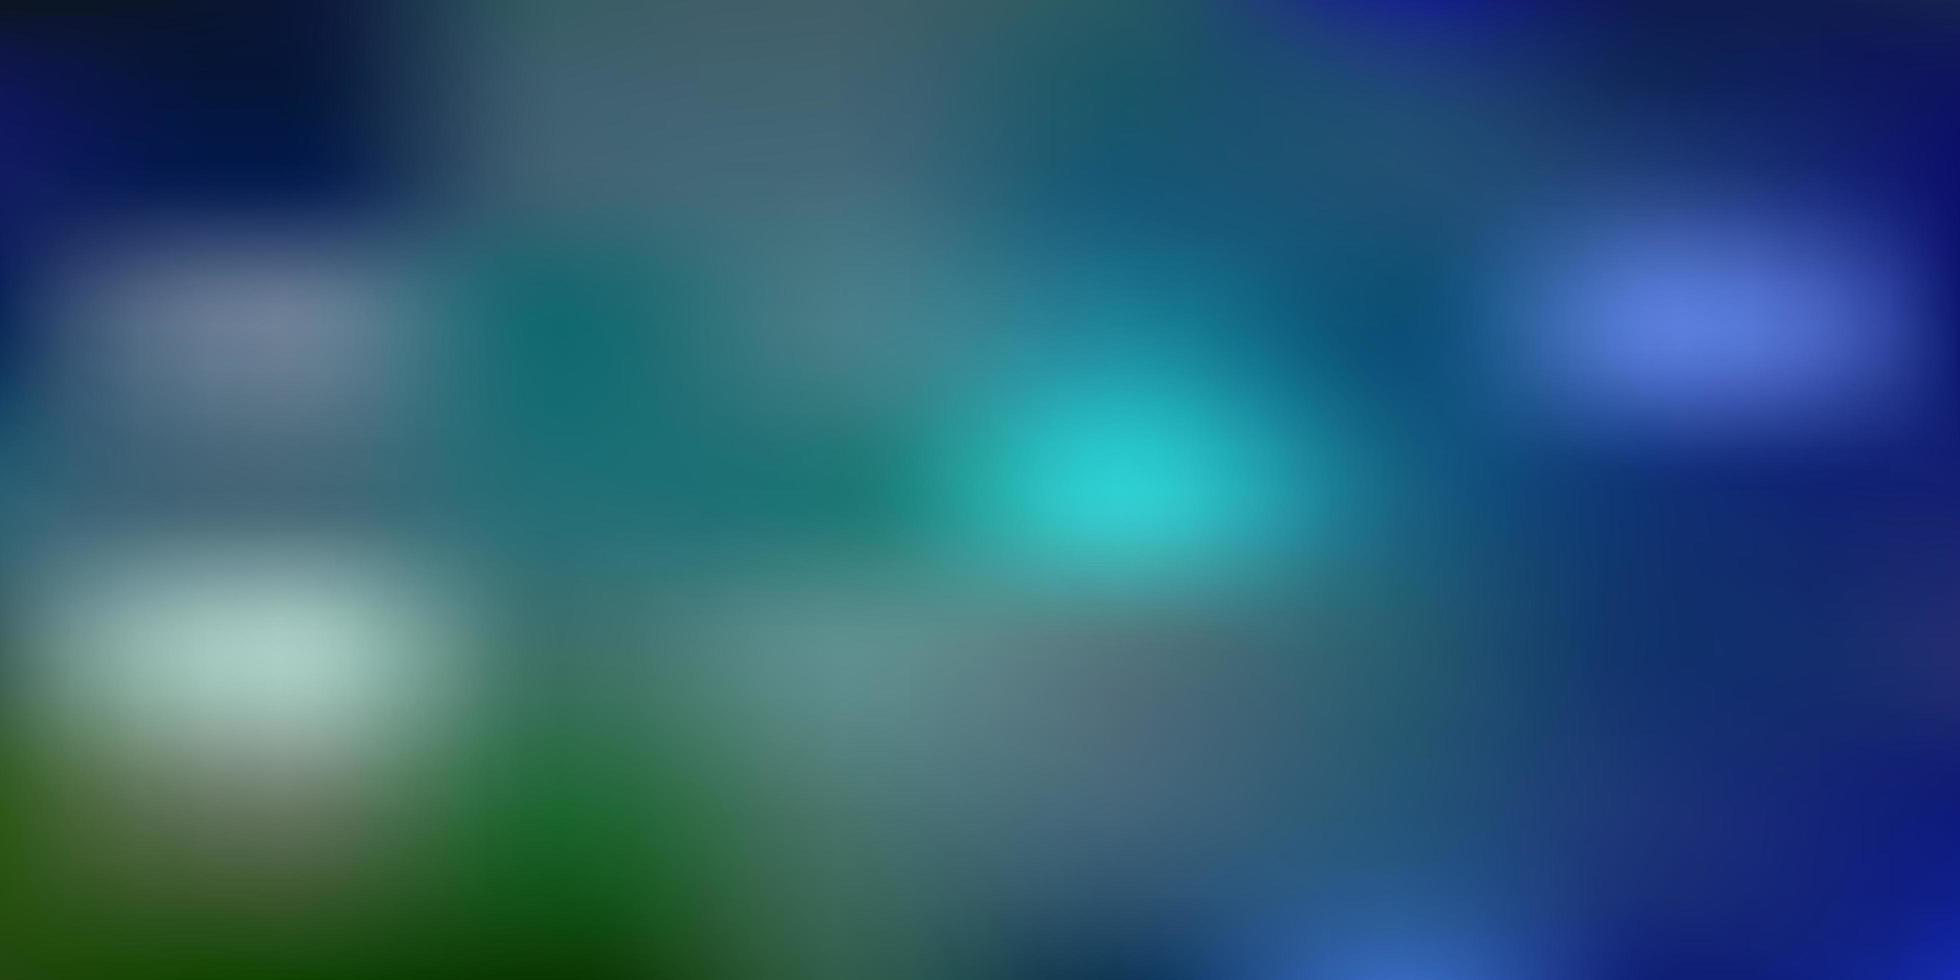 Fondo de desenfoque abstracto de vector azul claro, verde.